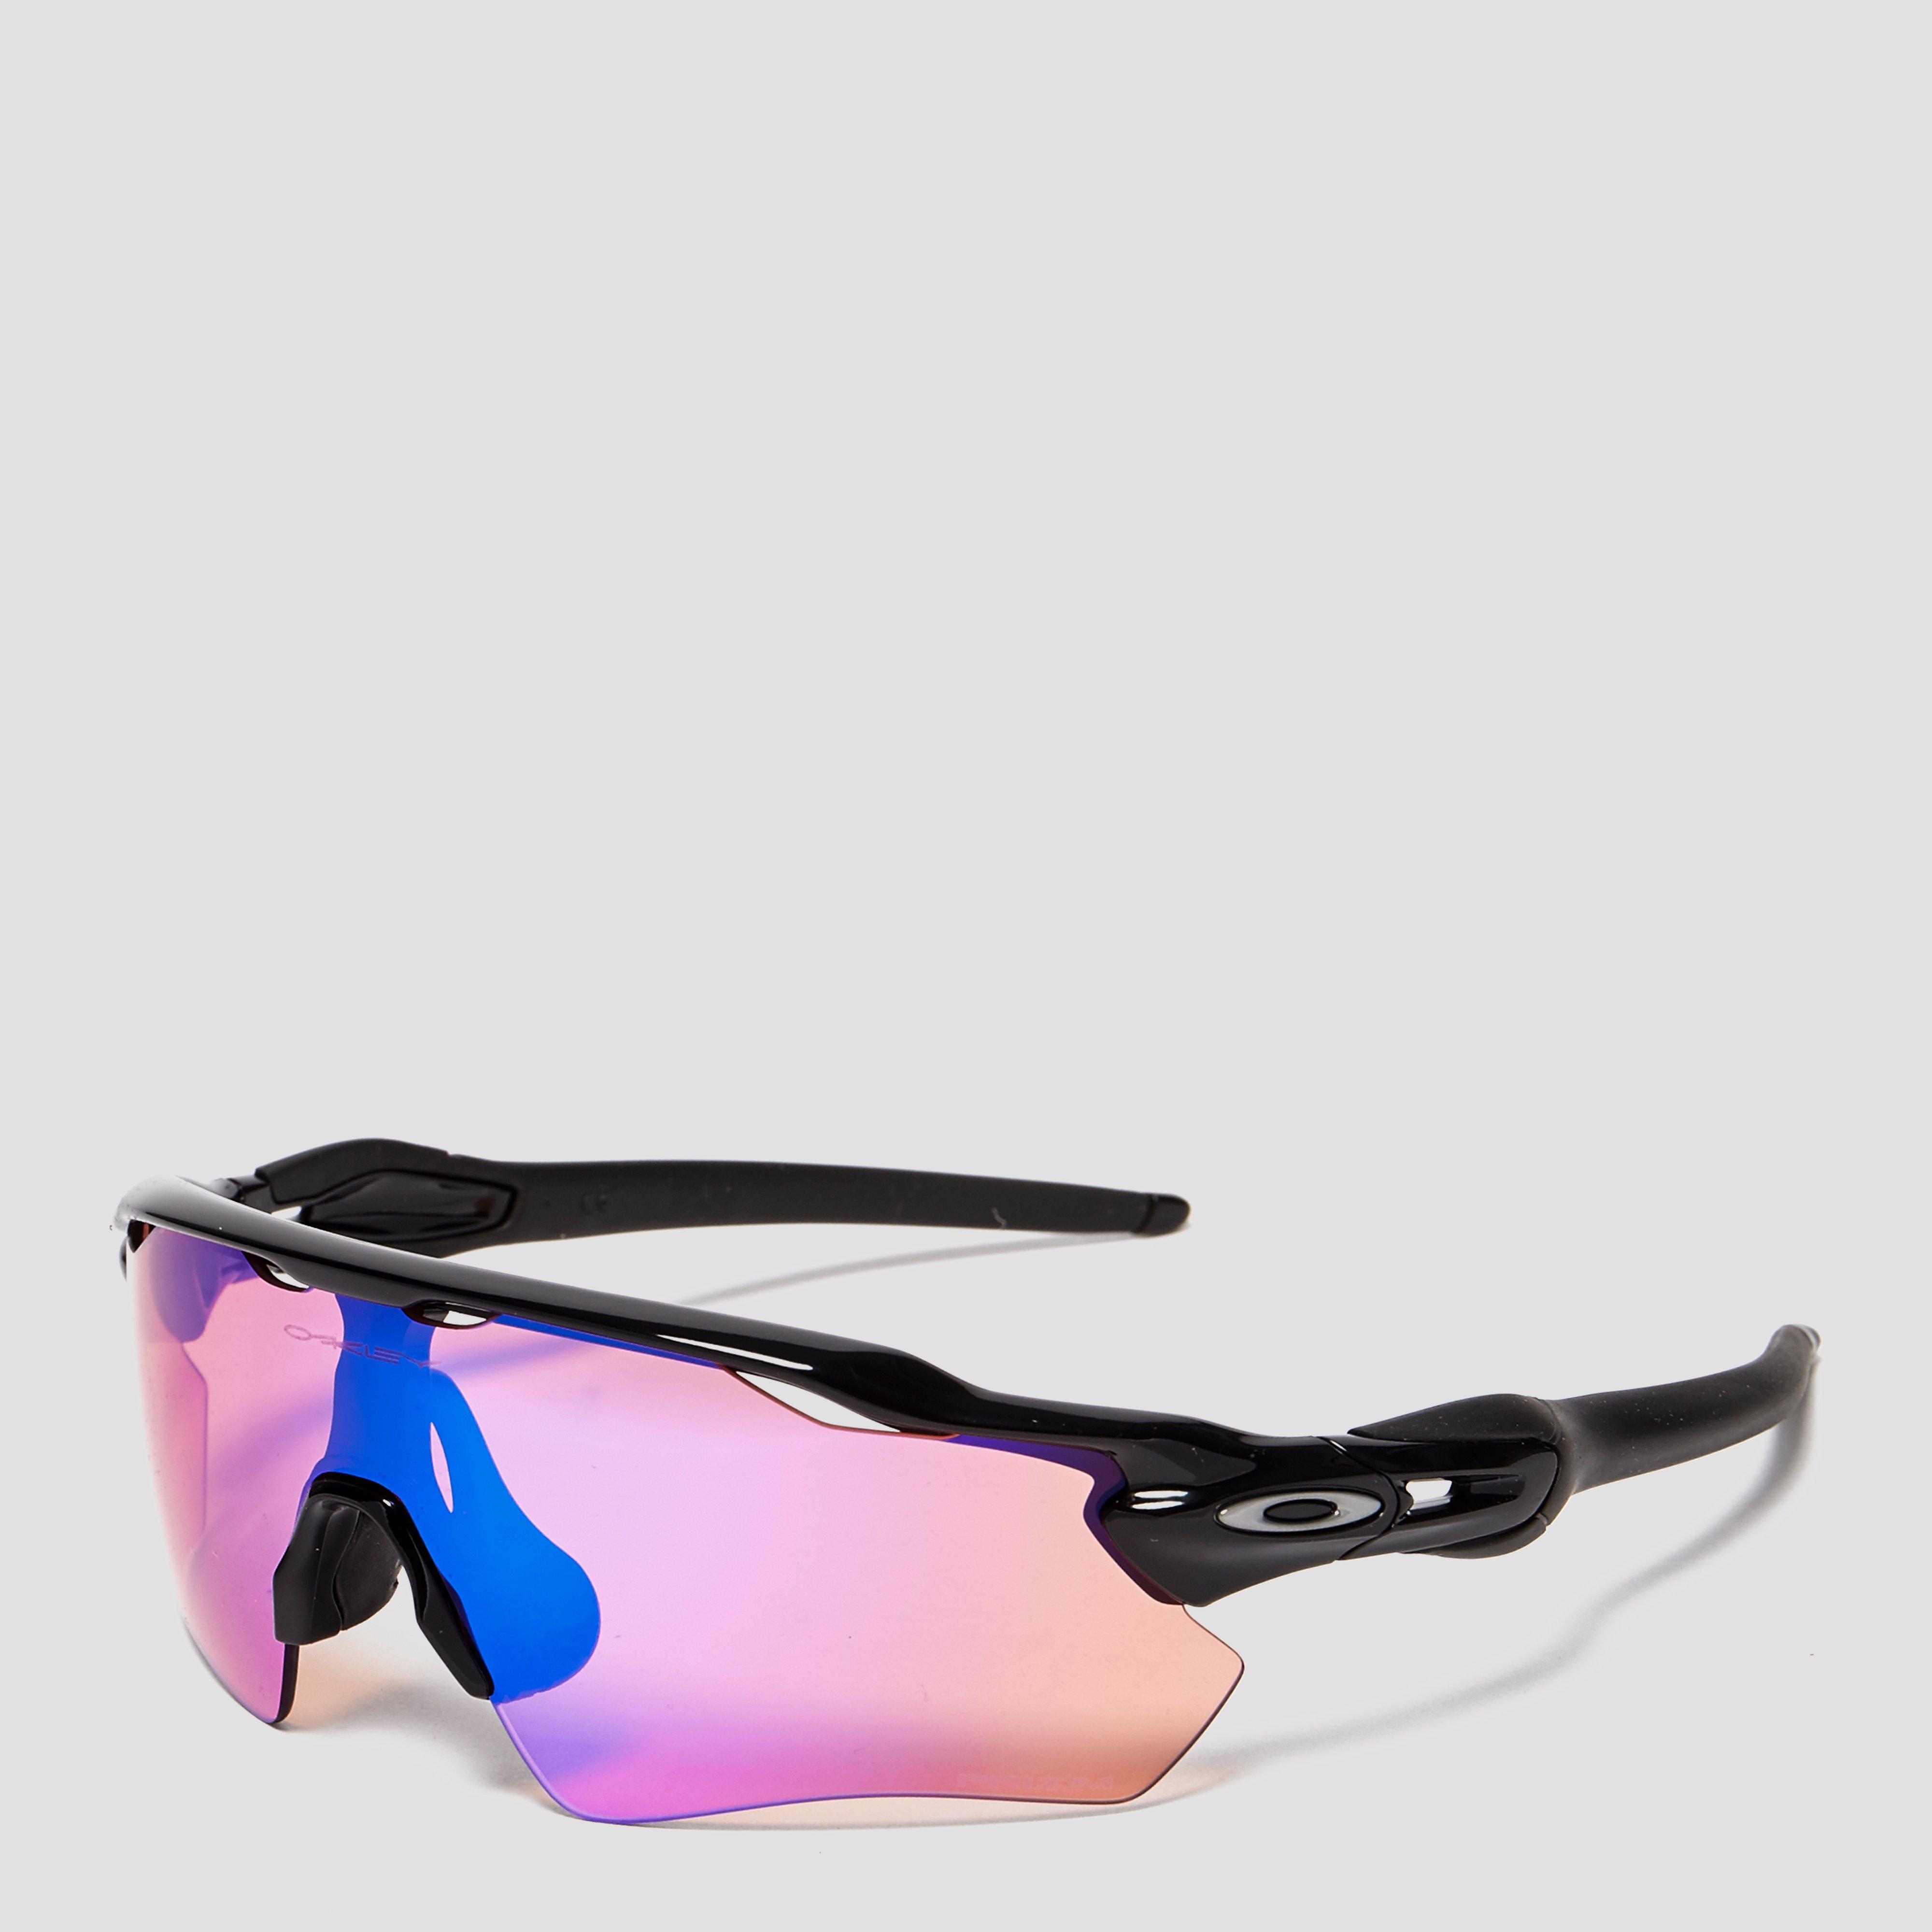 Oakley Radar EV Path Prizm Sunglasses, Assorted